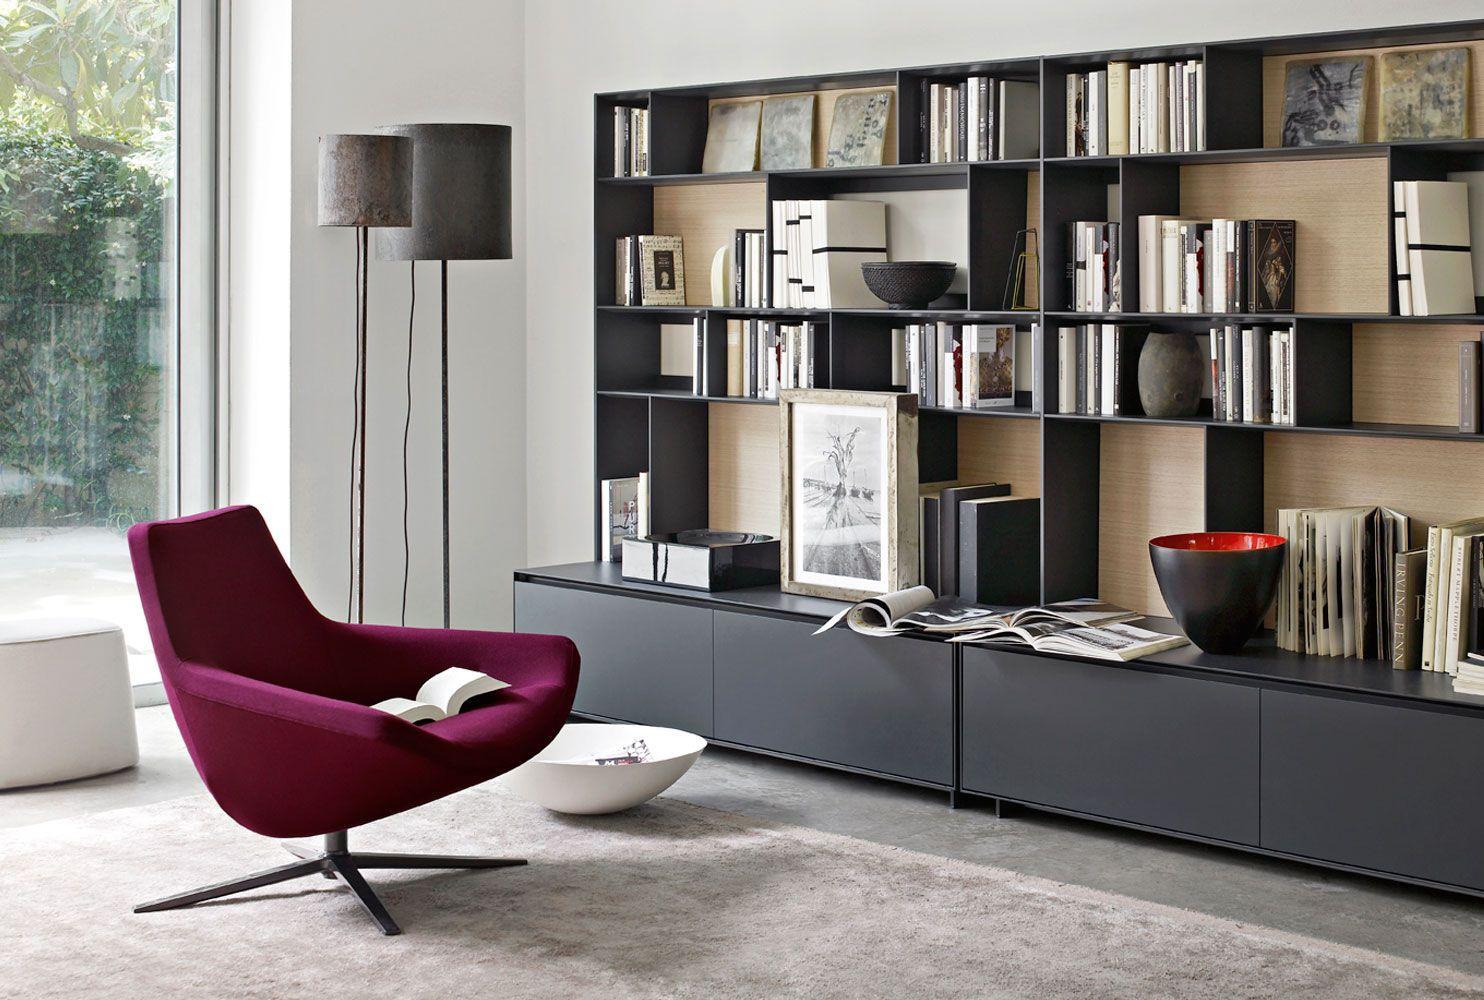 Armchair: METROPOLITAN '14 - Collection: B&B Italia - Design ...